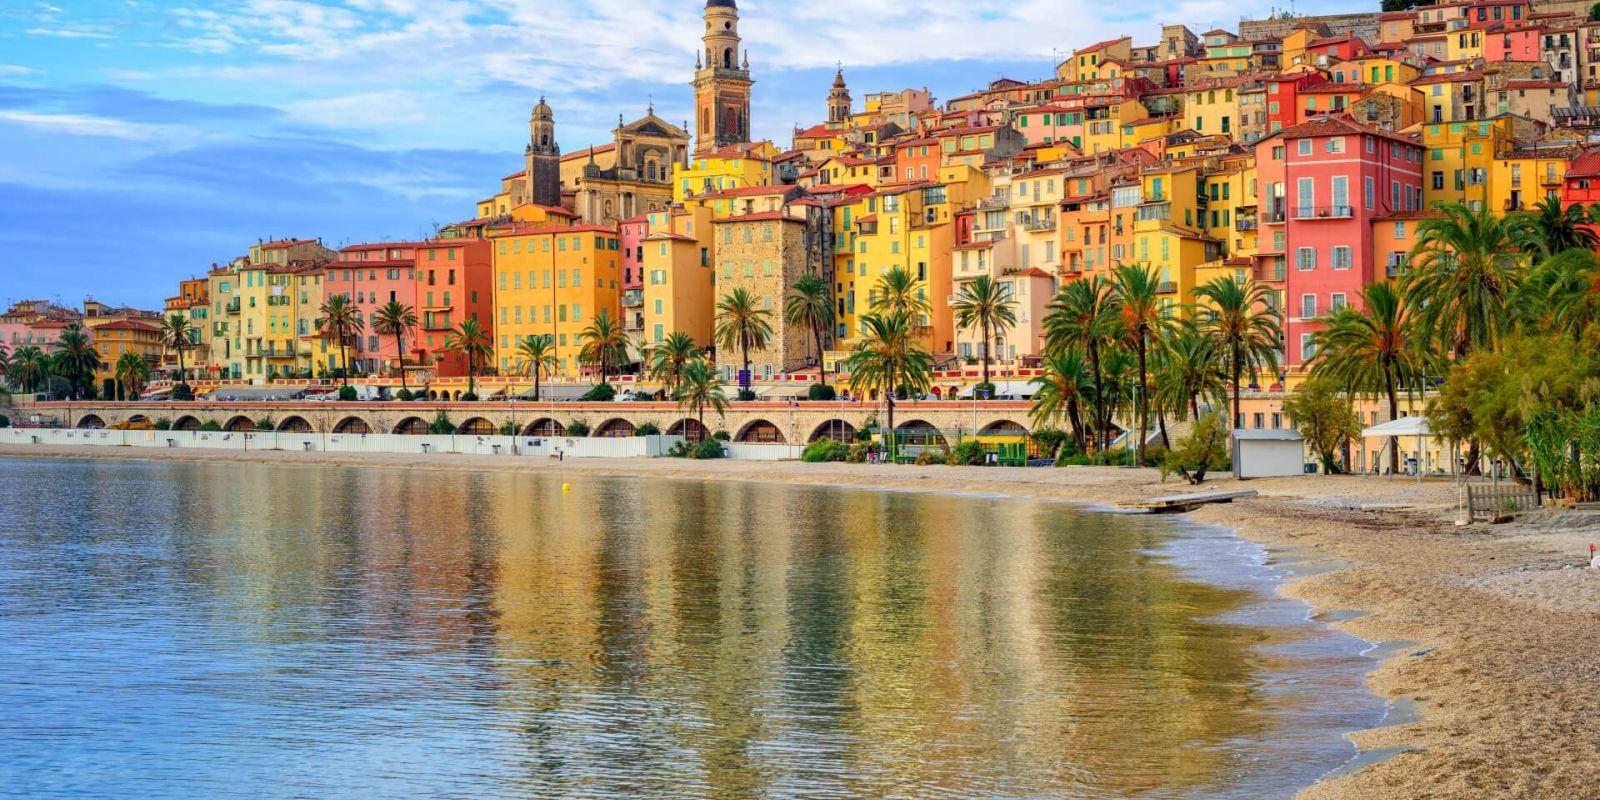 https://www.talamare.fr/medias/Location yacht Menton, louer un yacht à Menton sur la Riviera dei Fiori